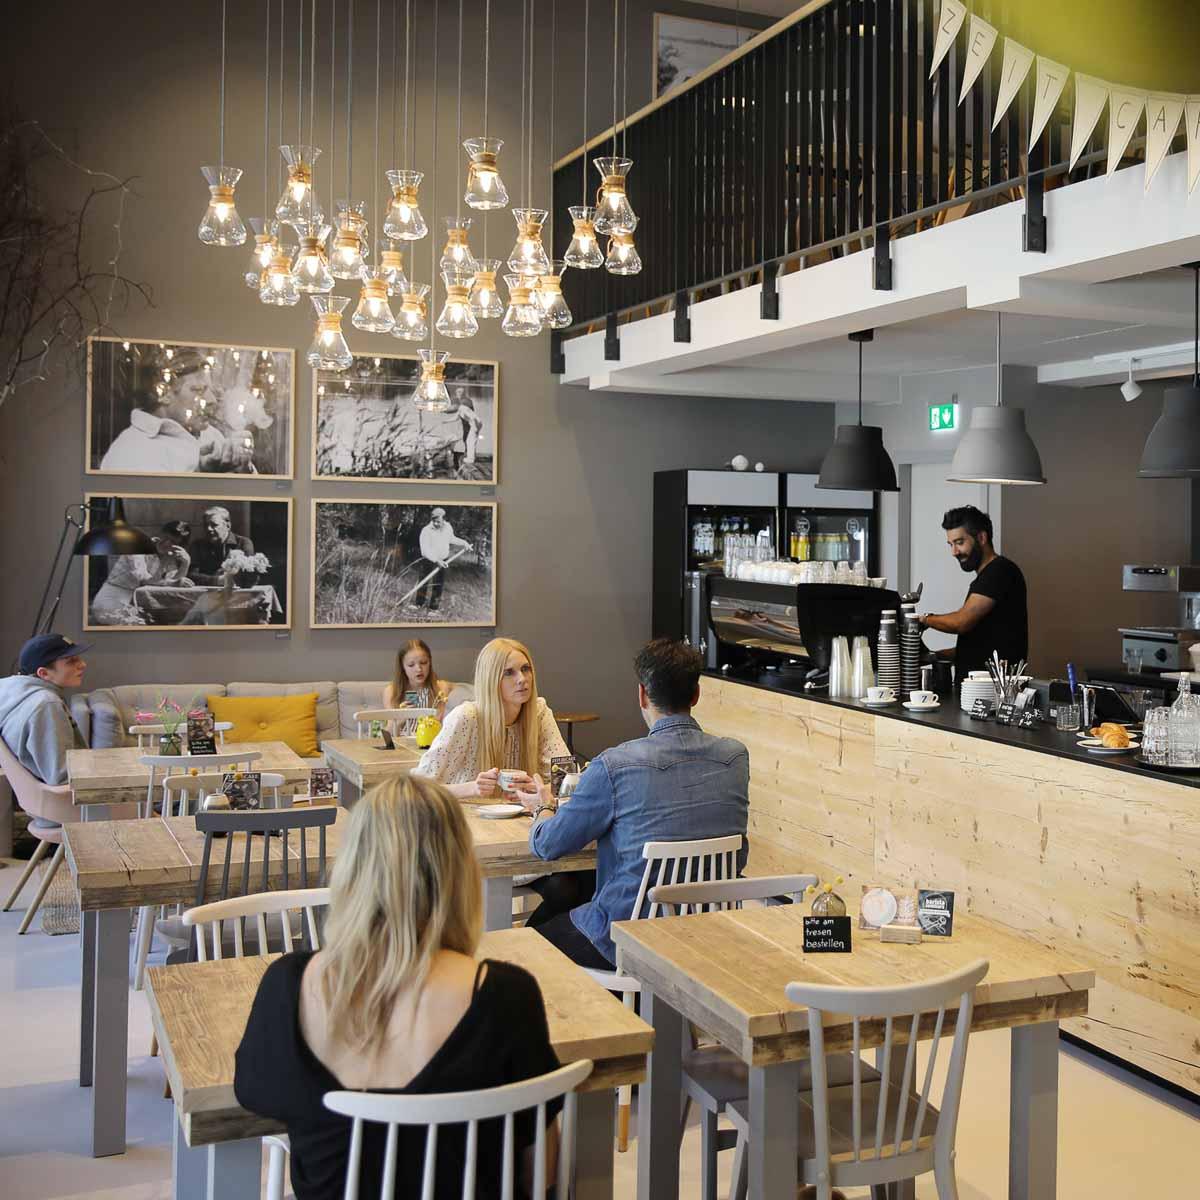 Cafe Design Entspannter Atmosphare: Identity